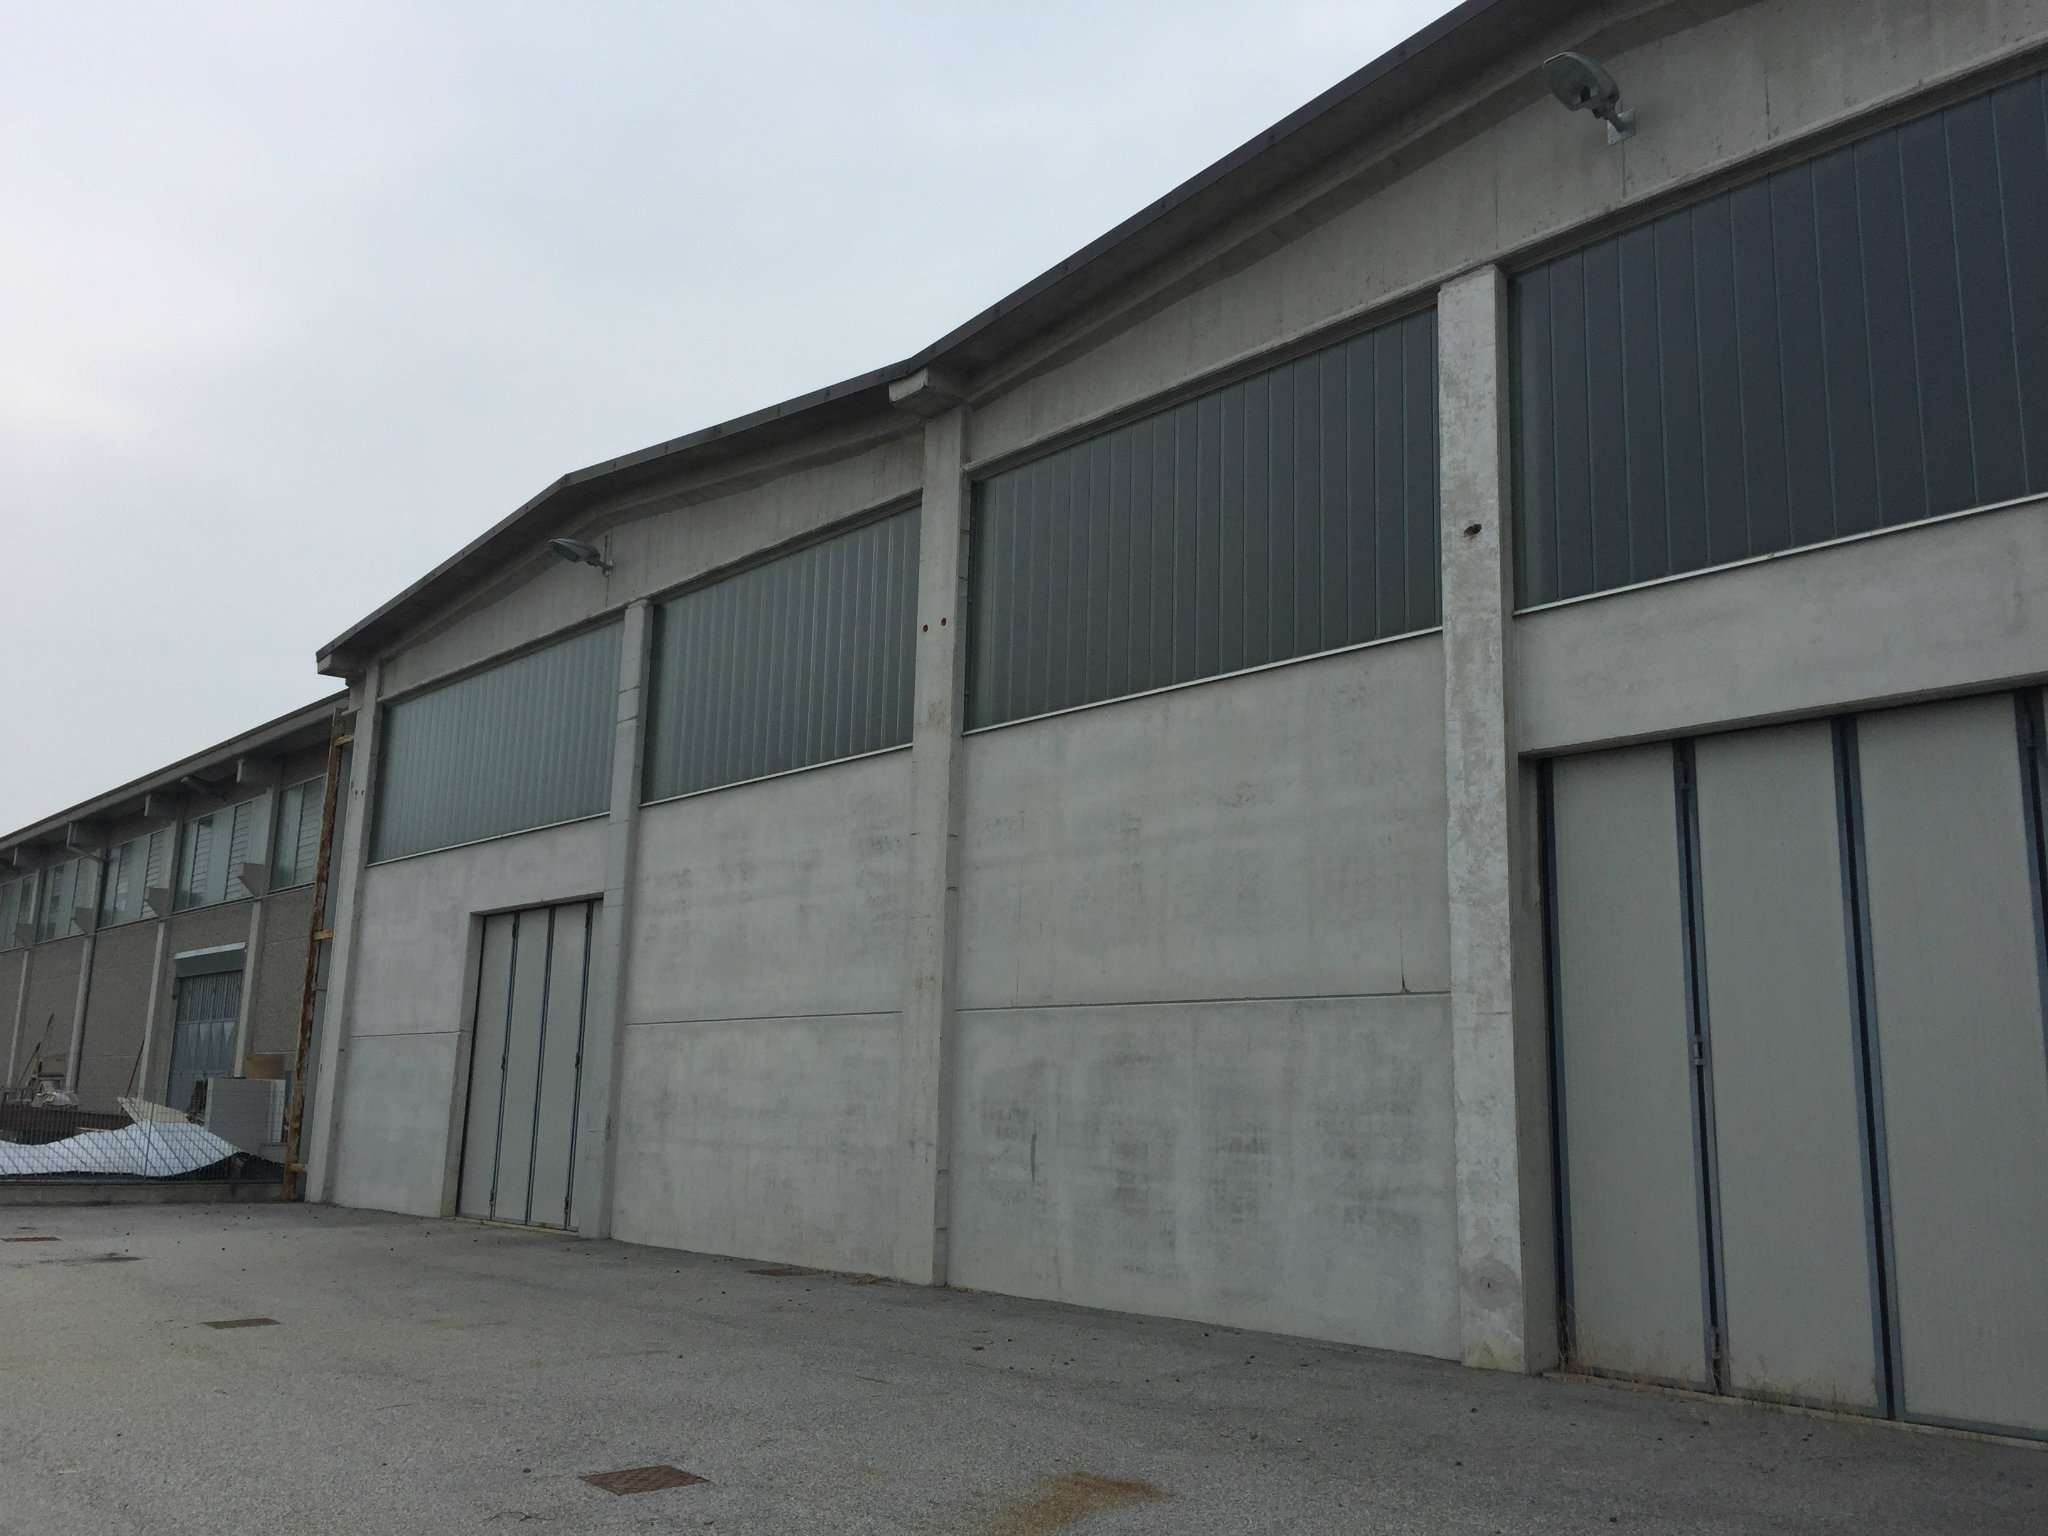 Capannone in vendita a Caramagna Piemonte, 9999 locali, Trattative riservate | PortaleAgenzieImmobiliari.it